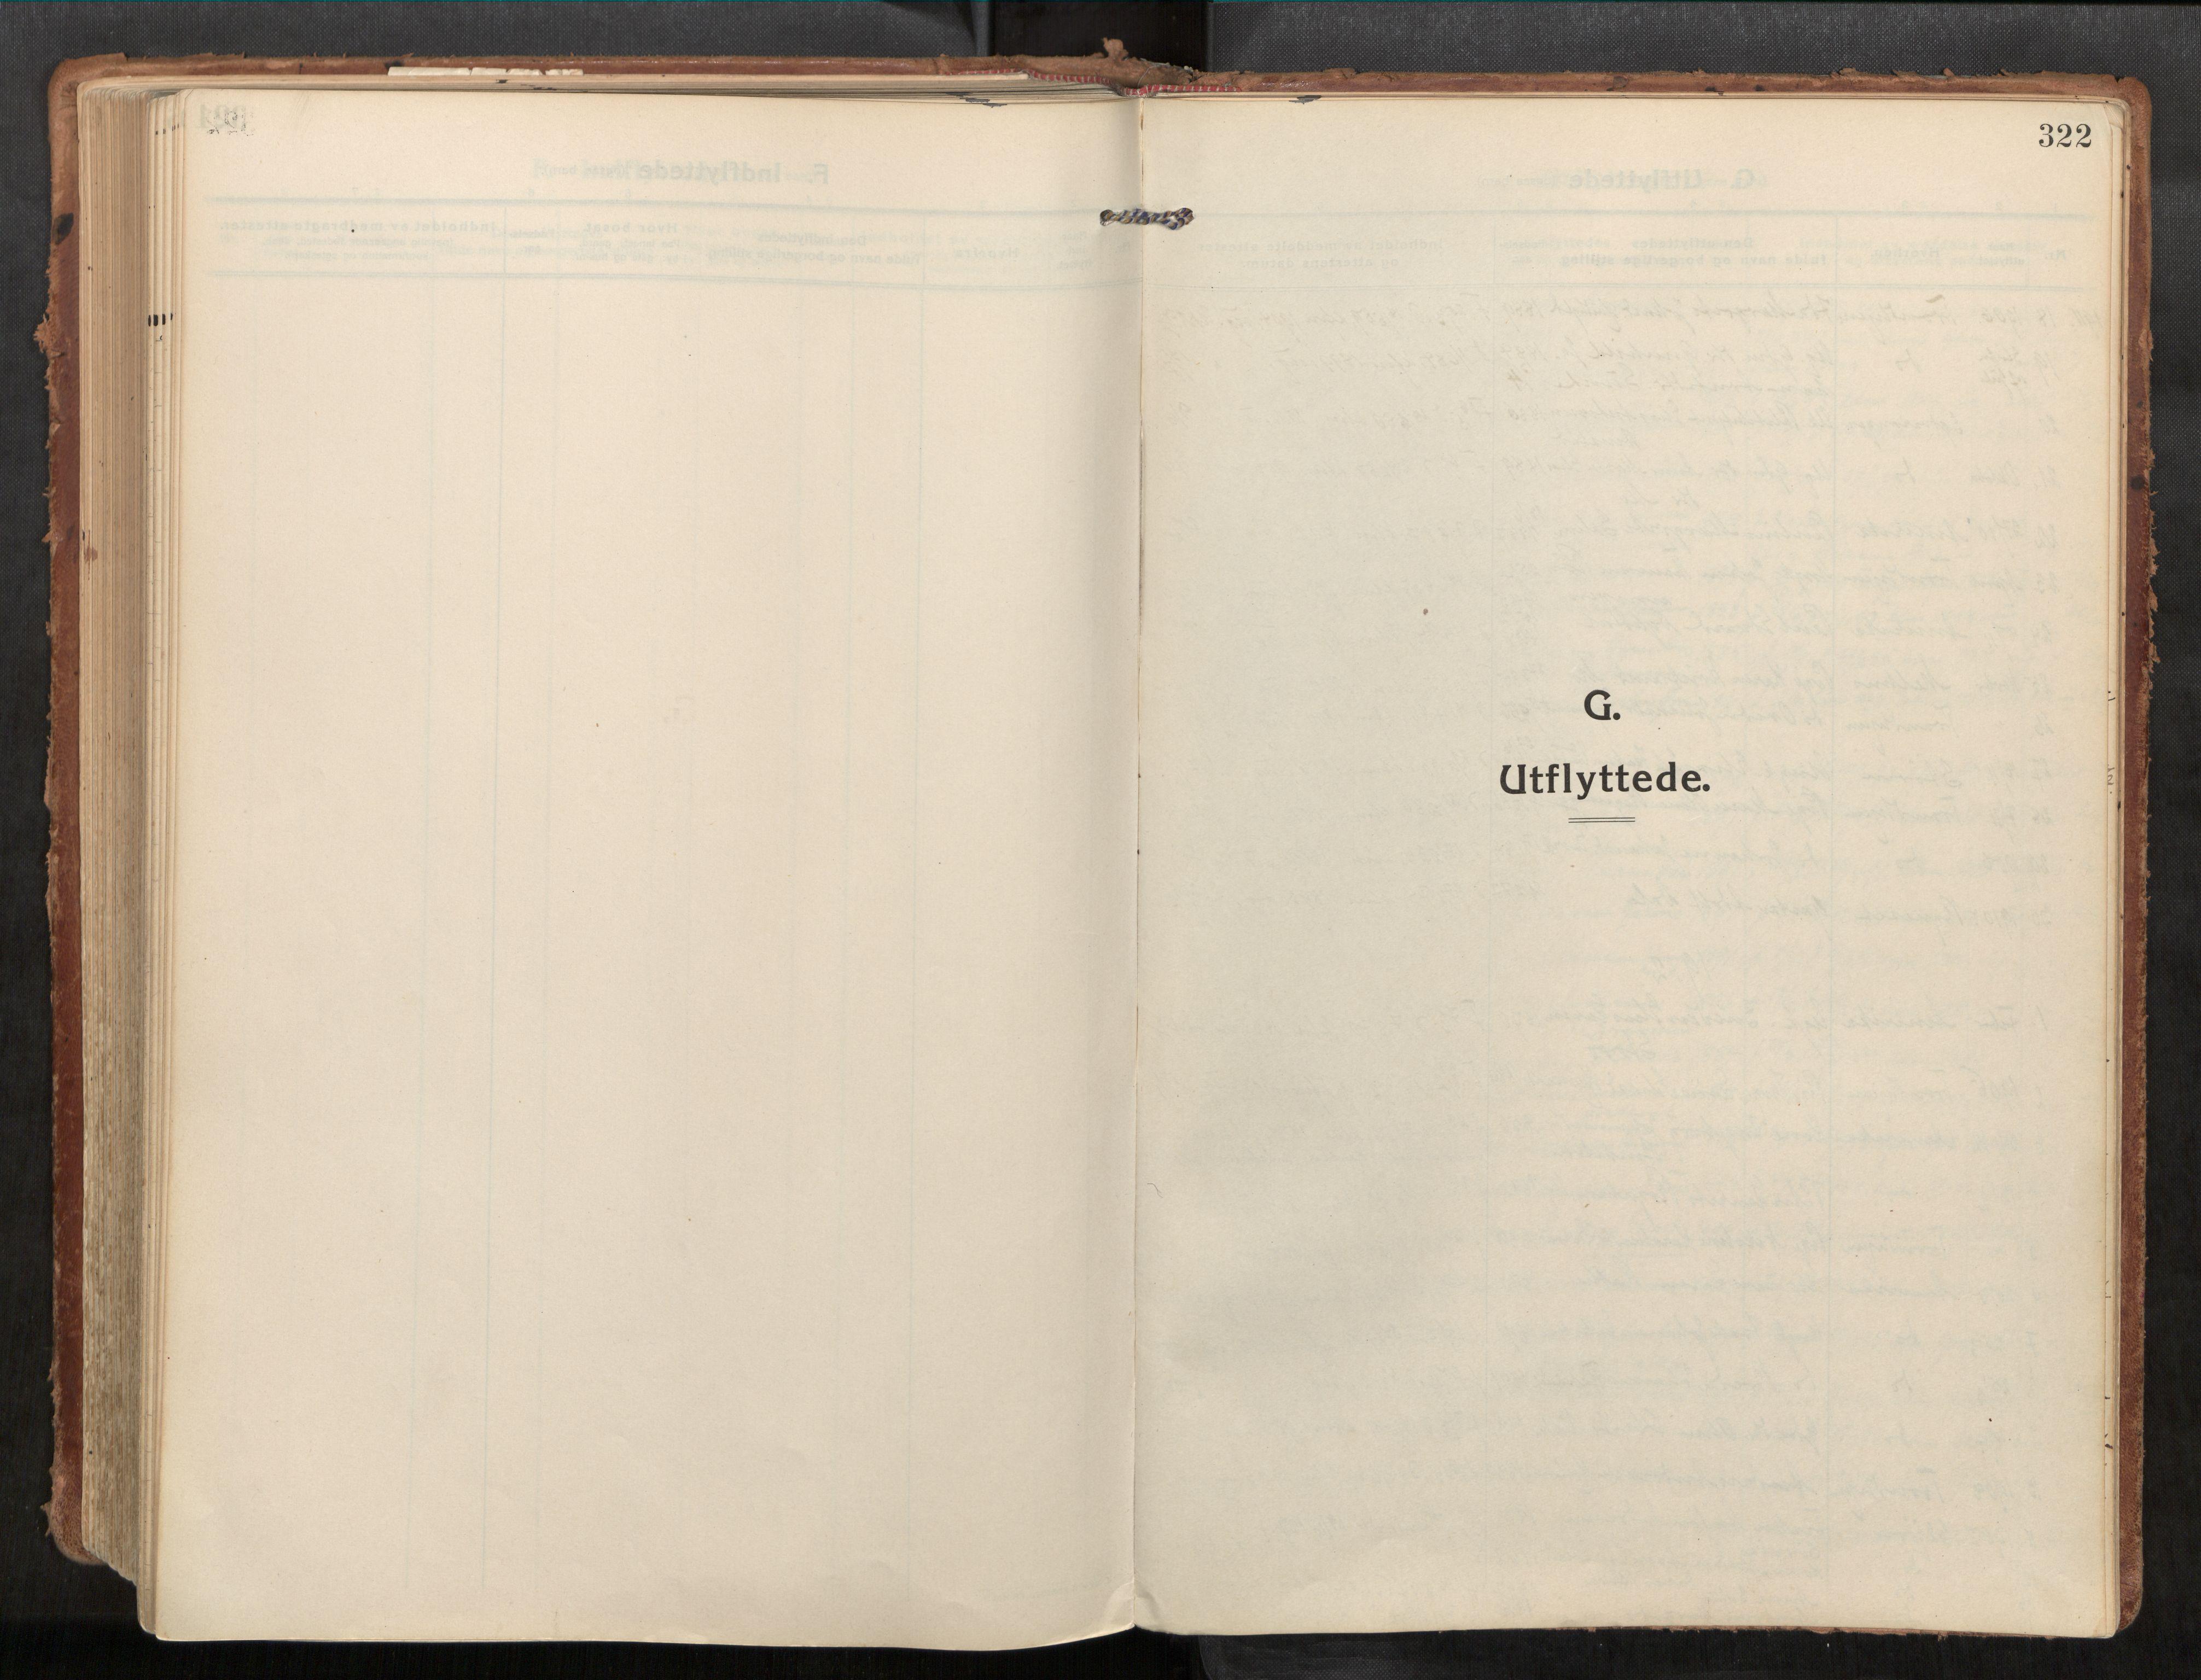 SAT, Stadsbygd sokneprestkontor, I/I1/I1a/L0001: Ministerialbok nr. 1, 1911-1929, s. 322